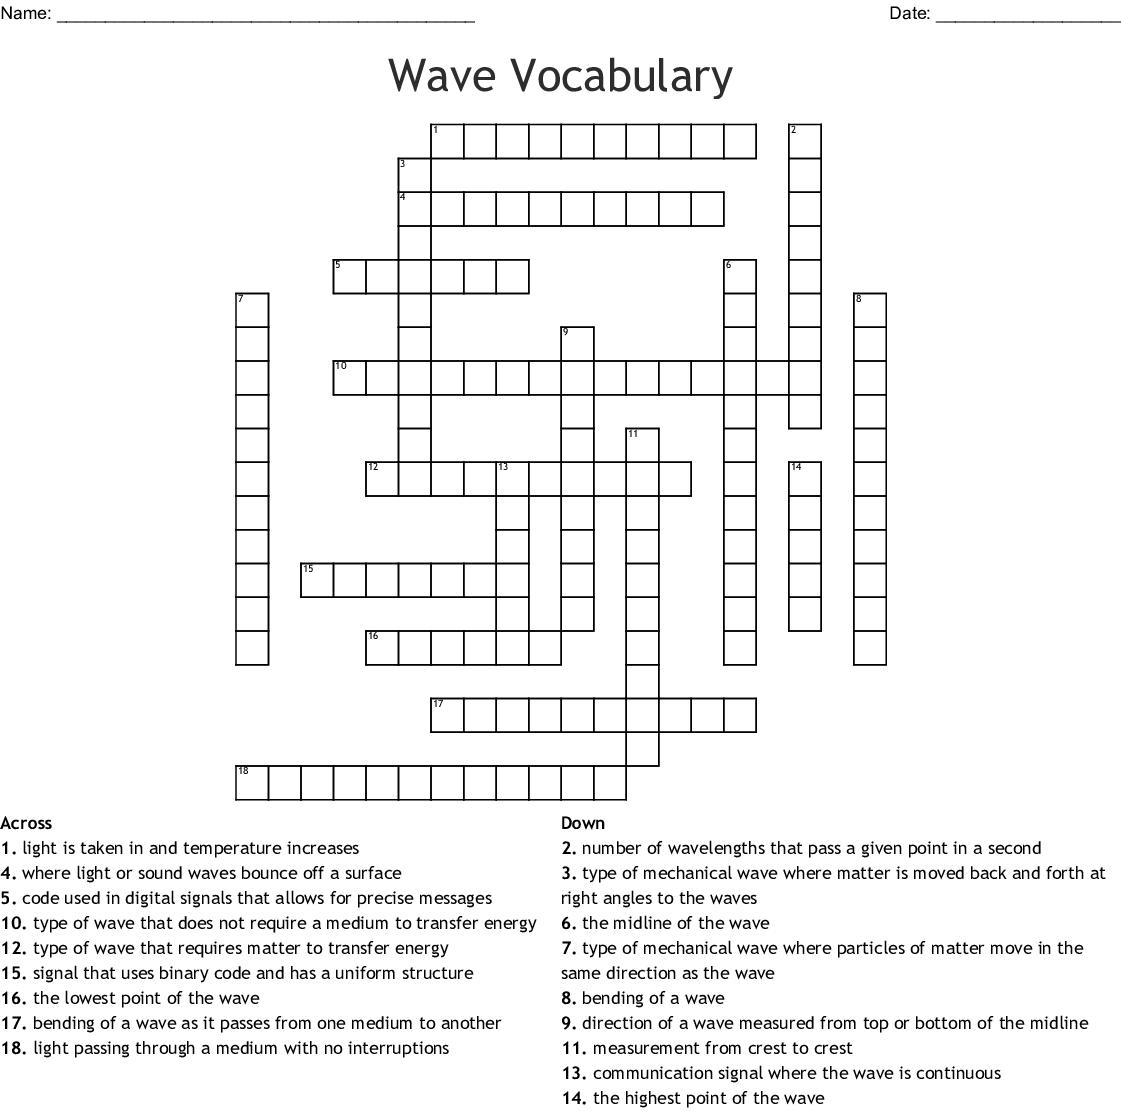 Waves Worksheet Answer Key - Nidecmege